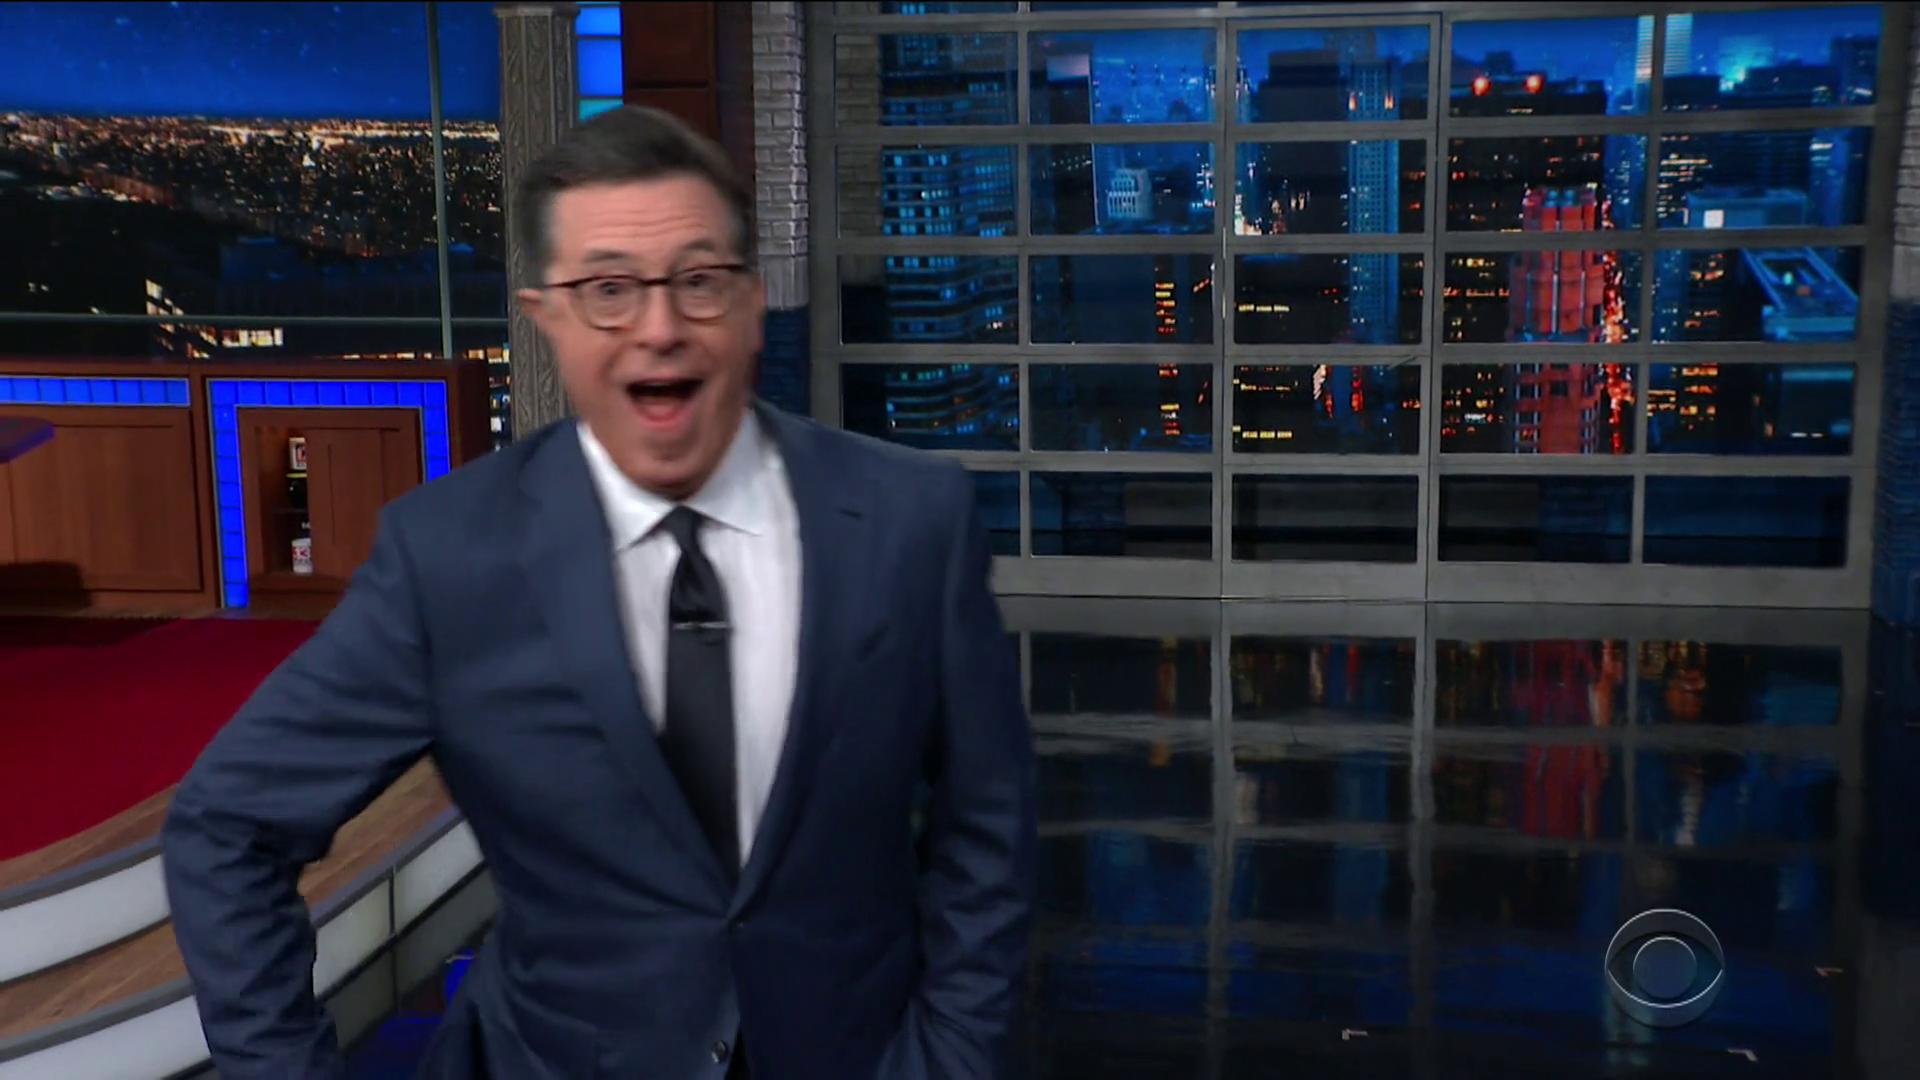 Stephen Colbert 2019 01 11 50 Cent 1080p WEB x264-TBS